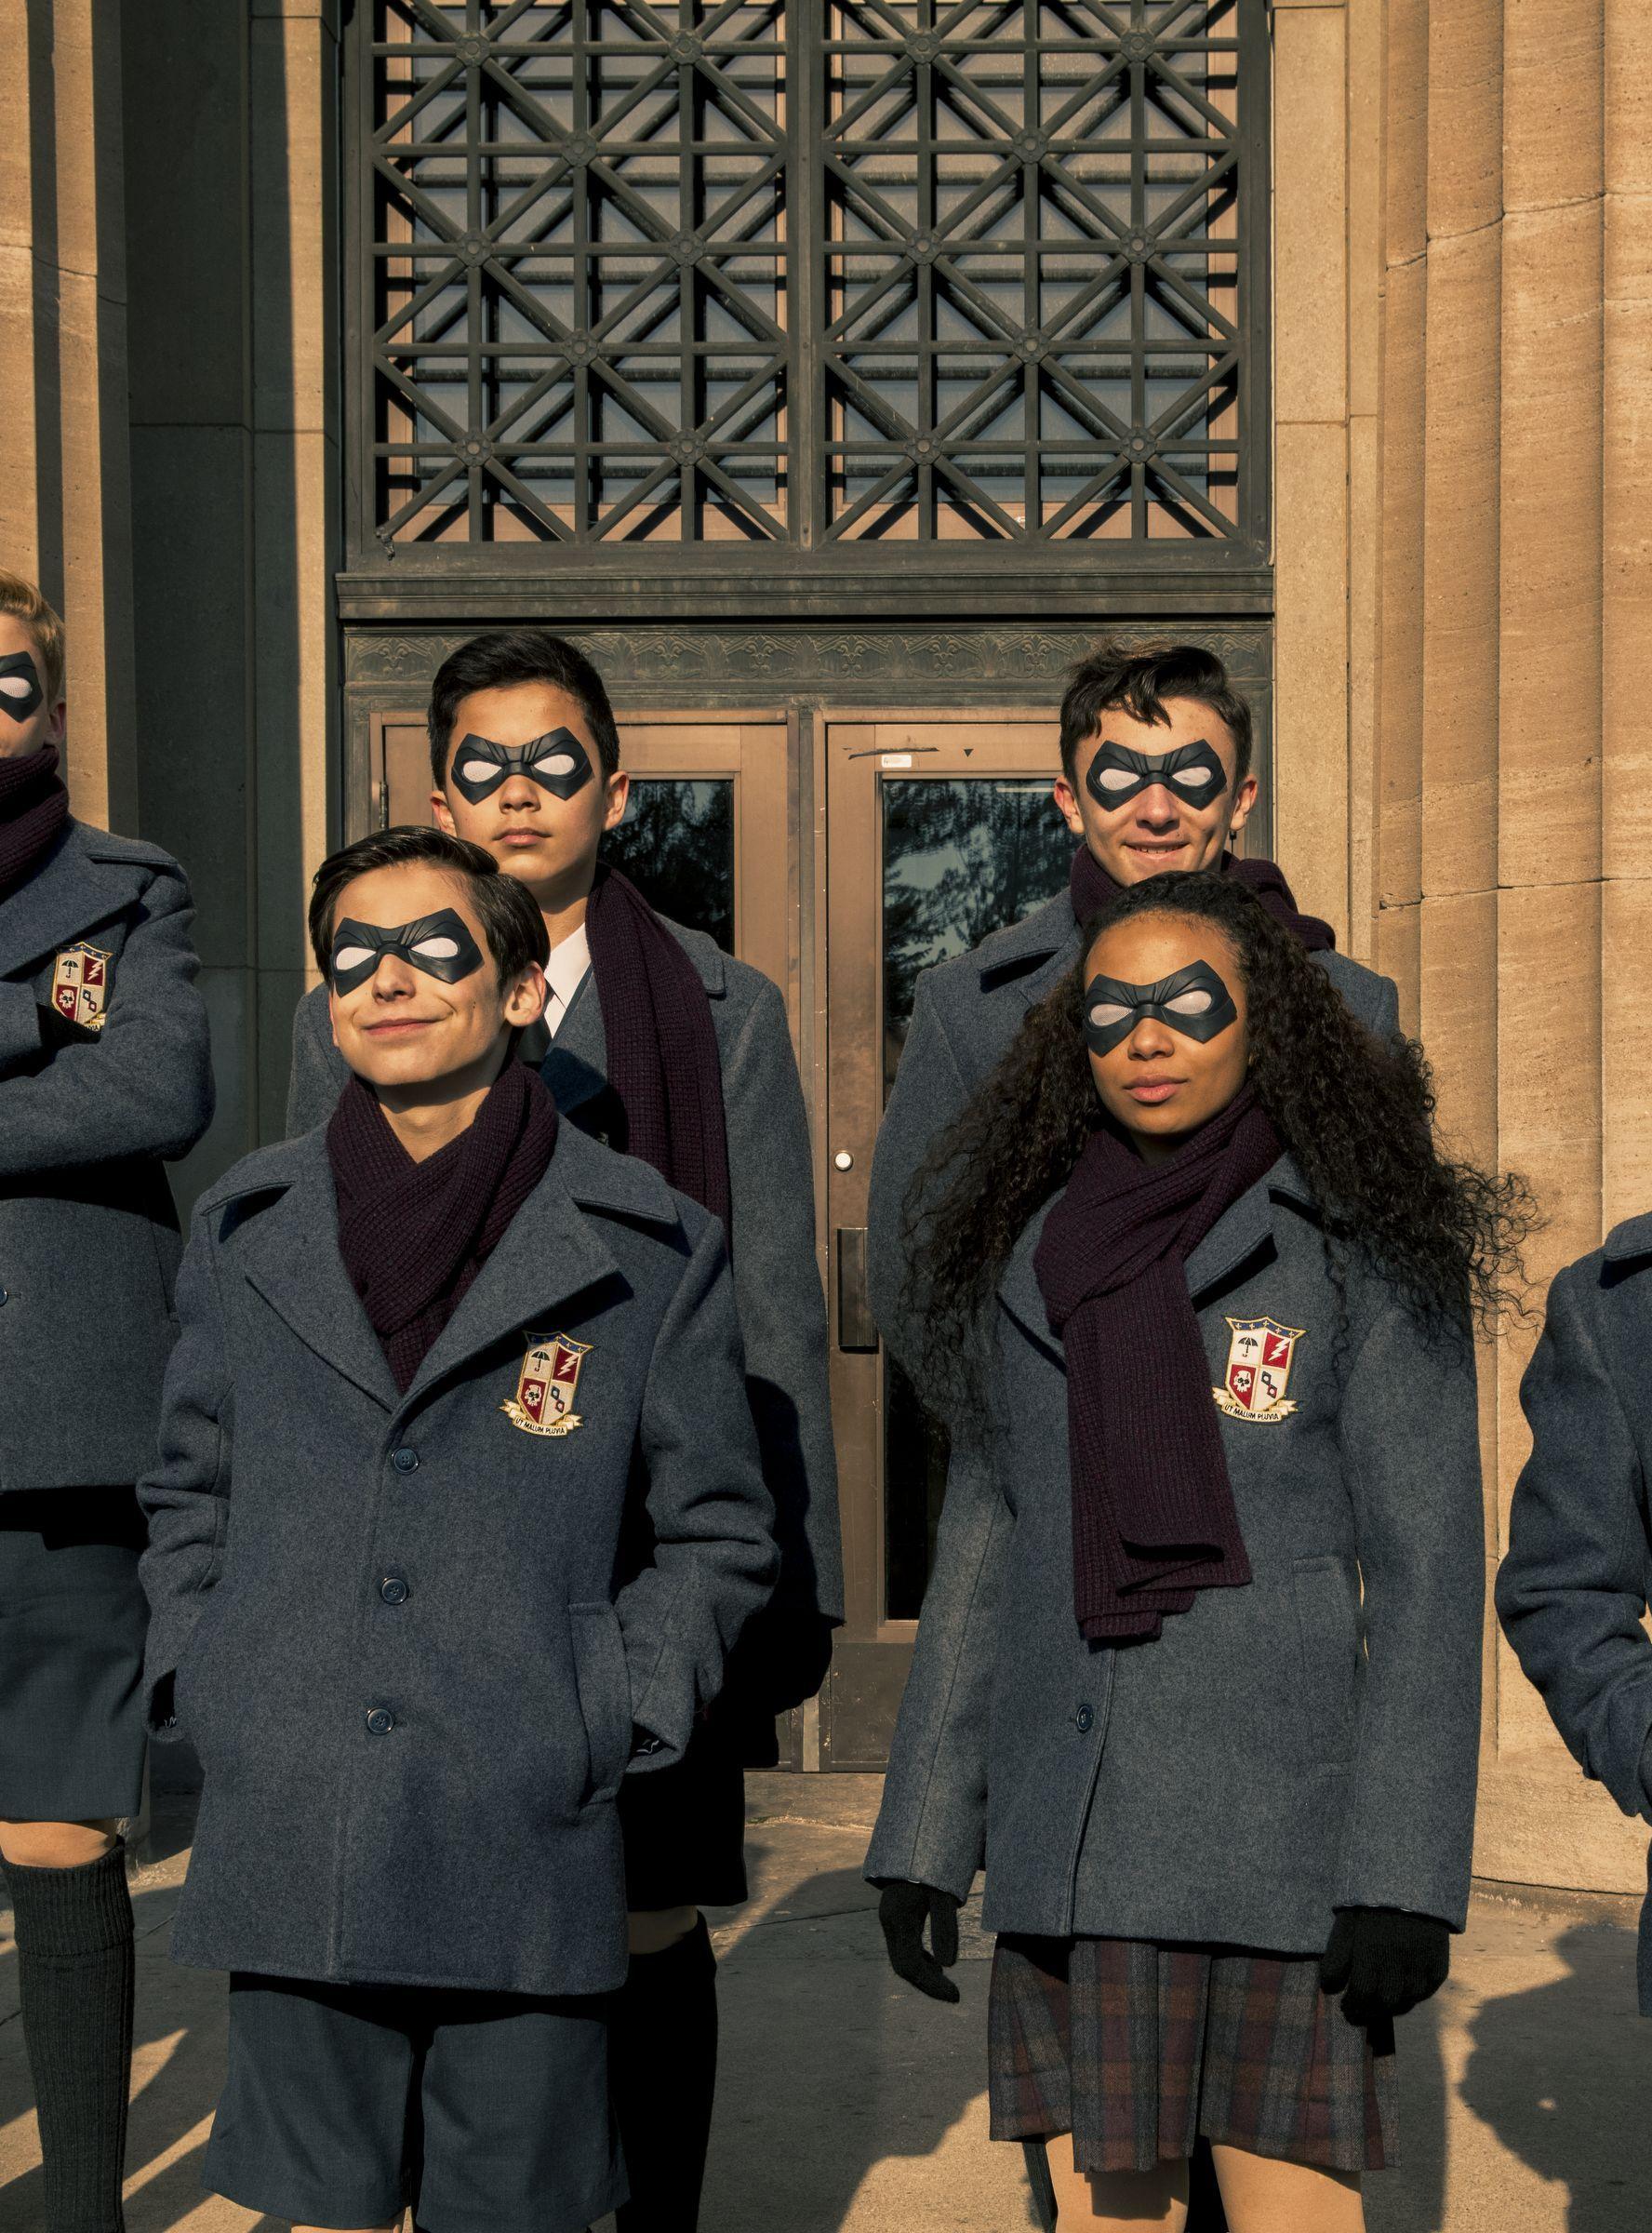 Netflix S The Umbrella Academy Is The Darkest Superhero